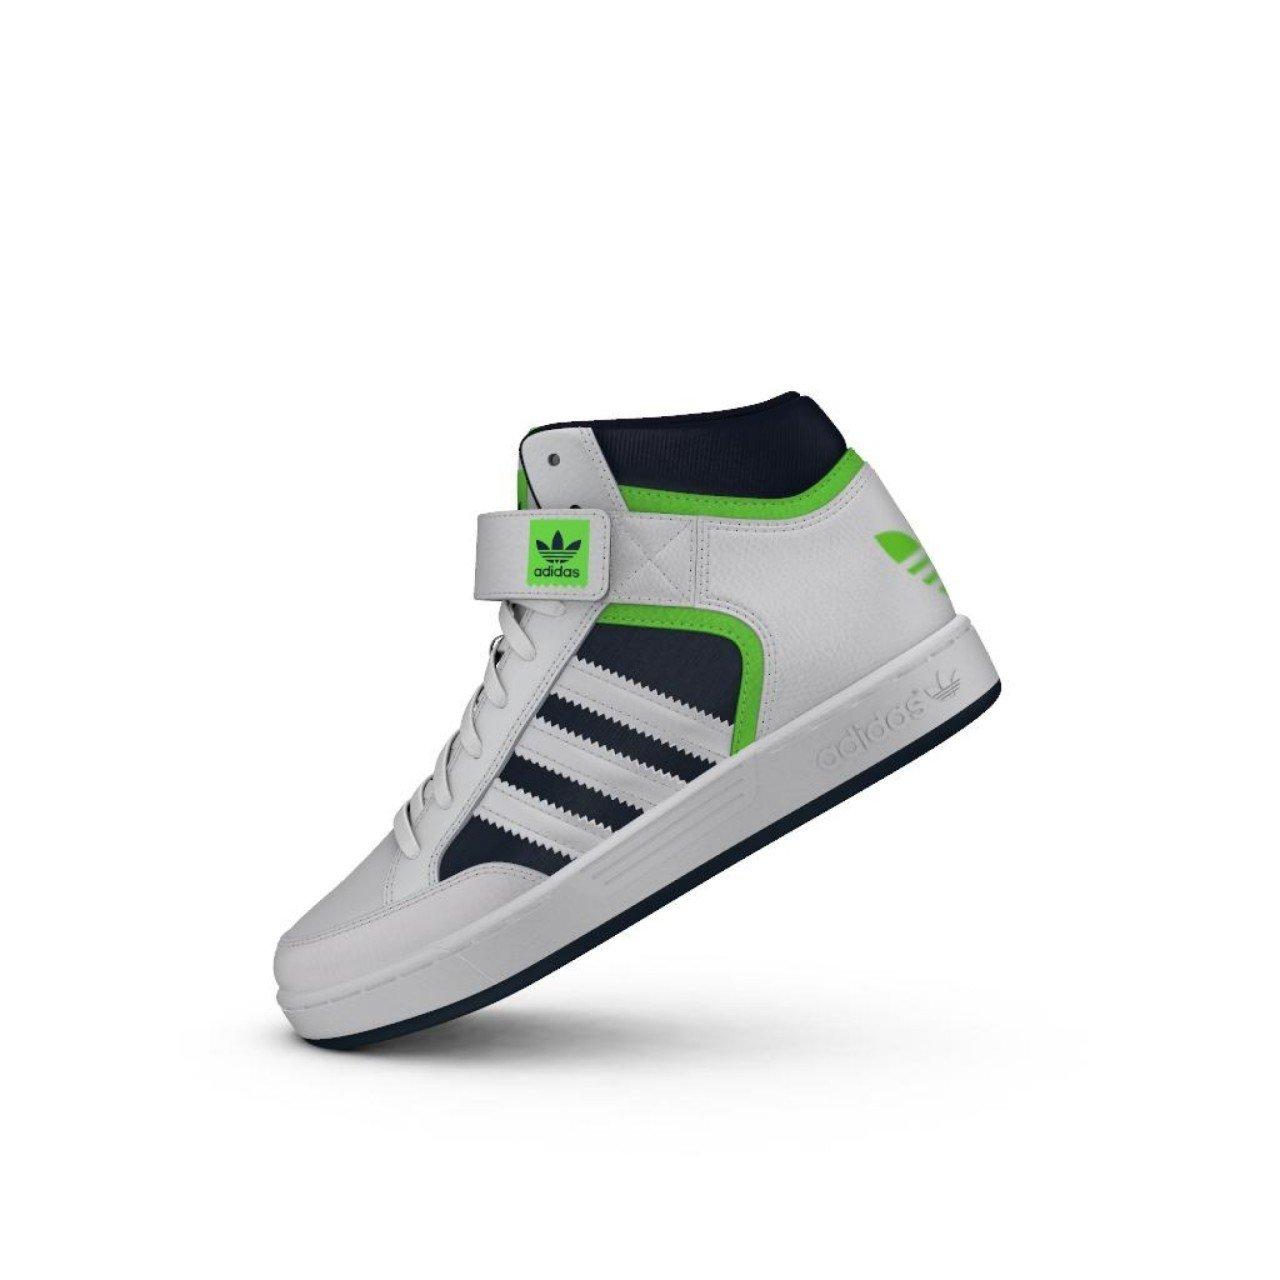 adidas Varial Mid J, Chaussures de Skate garçon adidas Originals